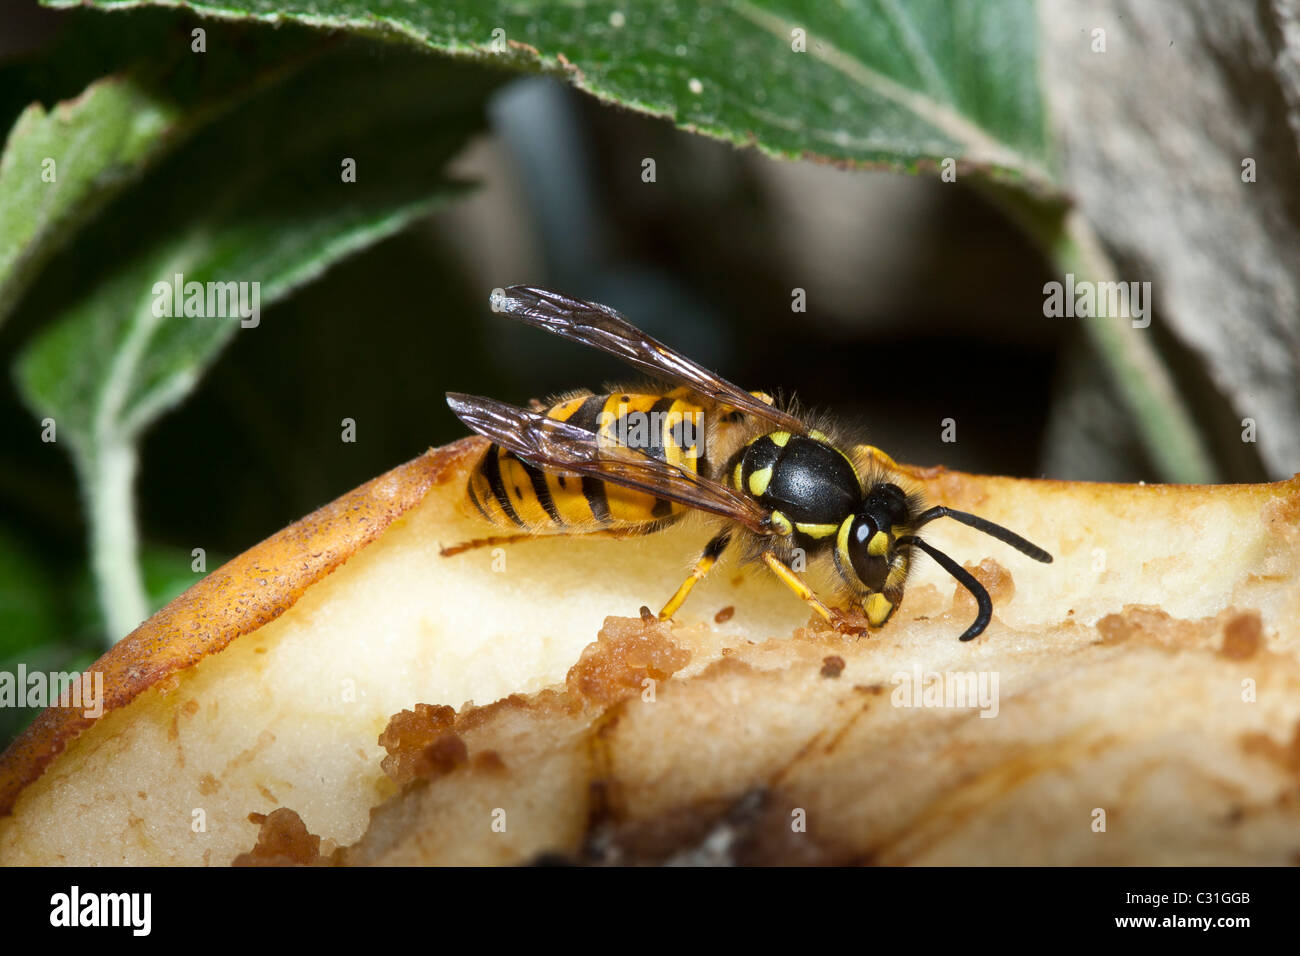 Common wasp yellow jacket, vespula vulgaris, feeding from eating apple on tree in English countryside, UK - Stock Image